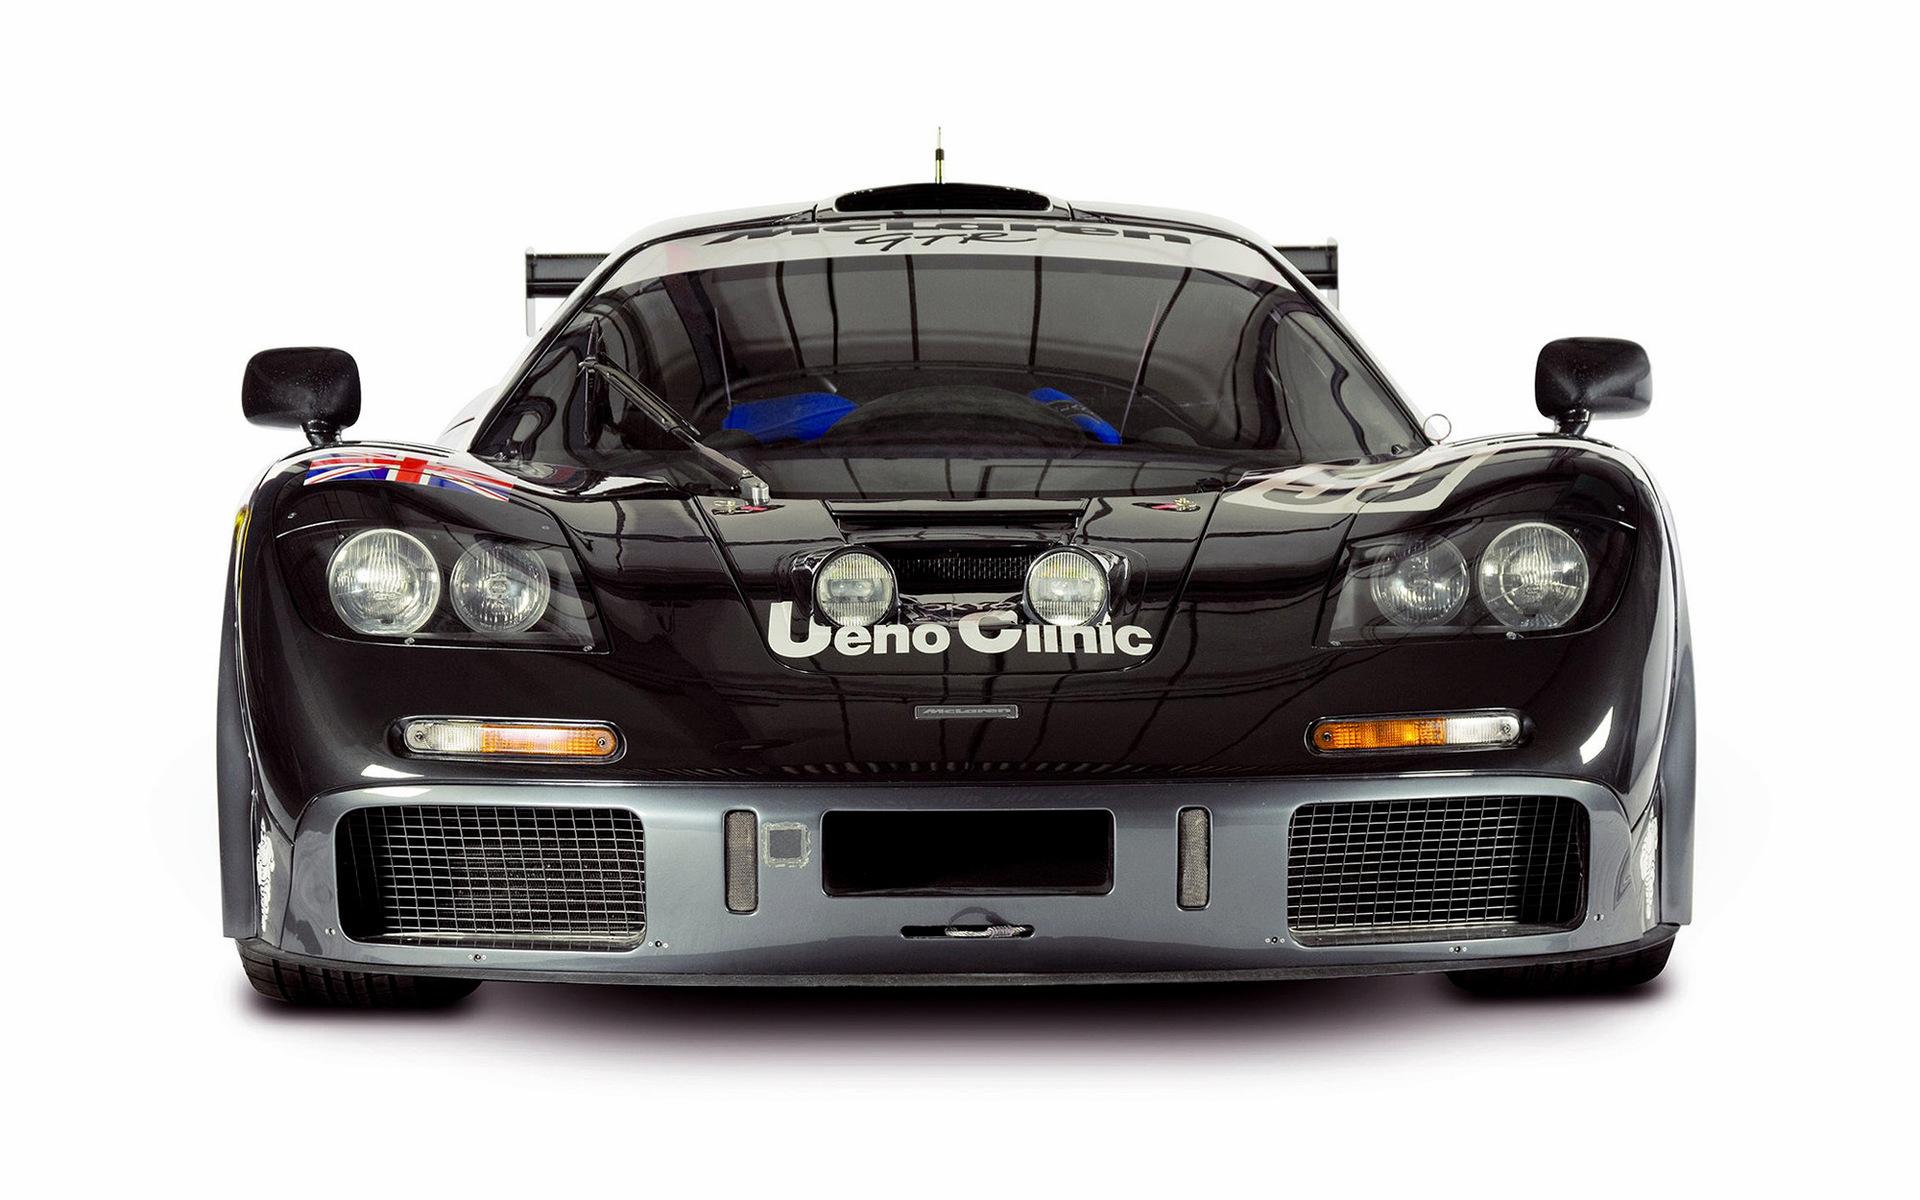 McLaren F1 GTR (1995) Wallpapers and HD Images - Car Pixel